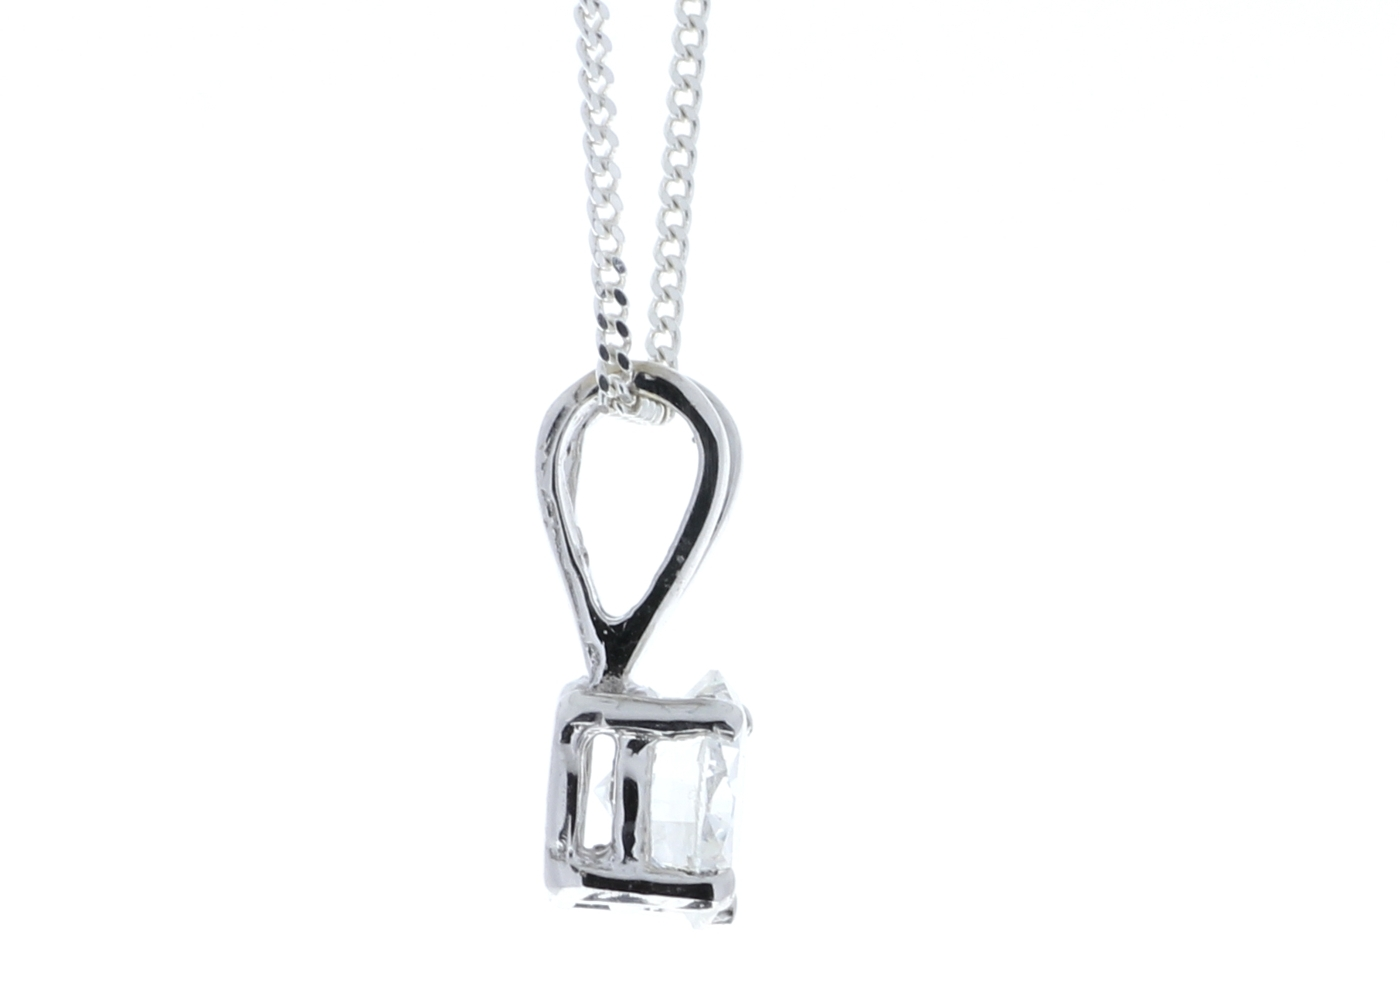 18ct Single Stone Claw Set Diamond Pendant 0.50 Carats - Image 3 of 4